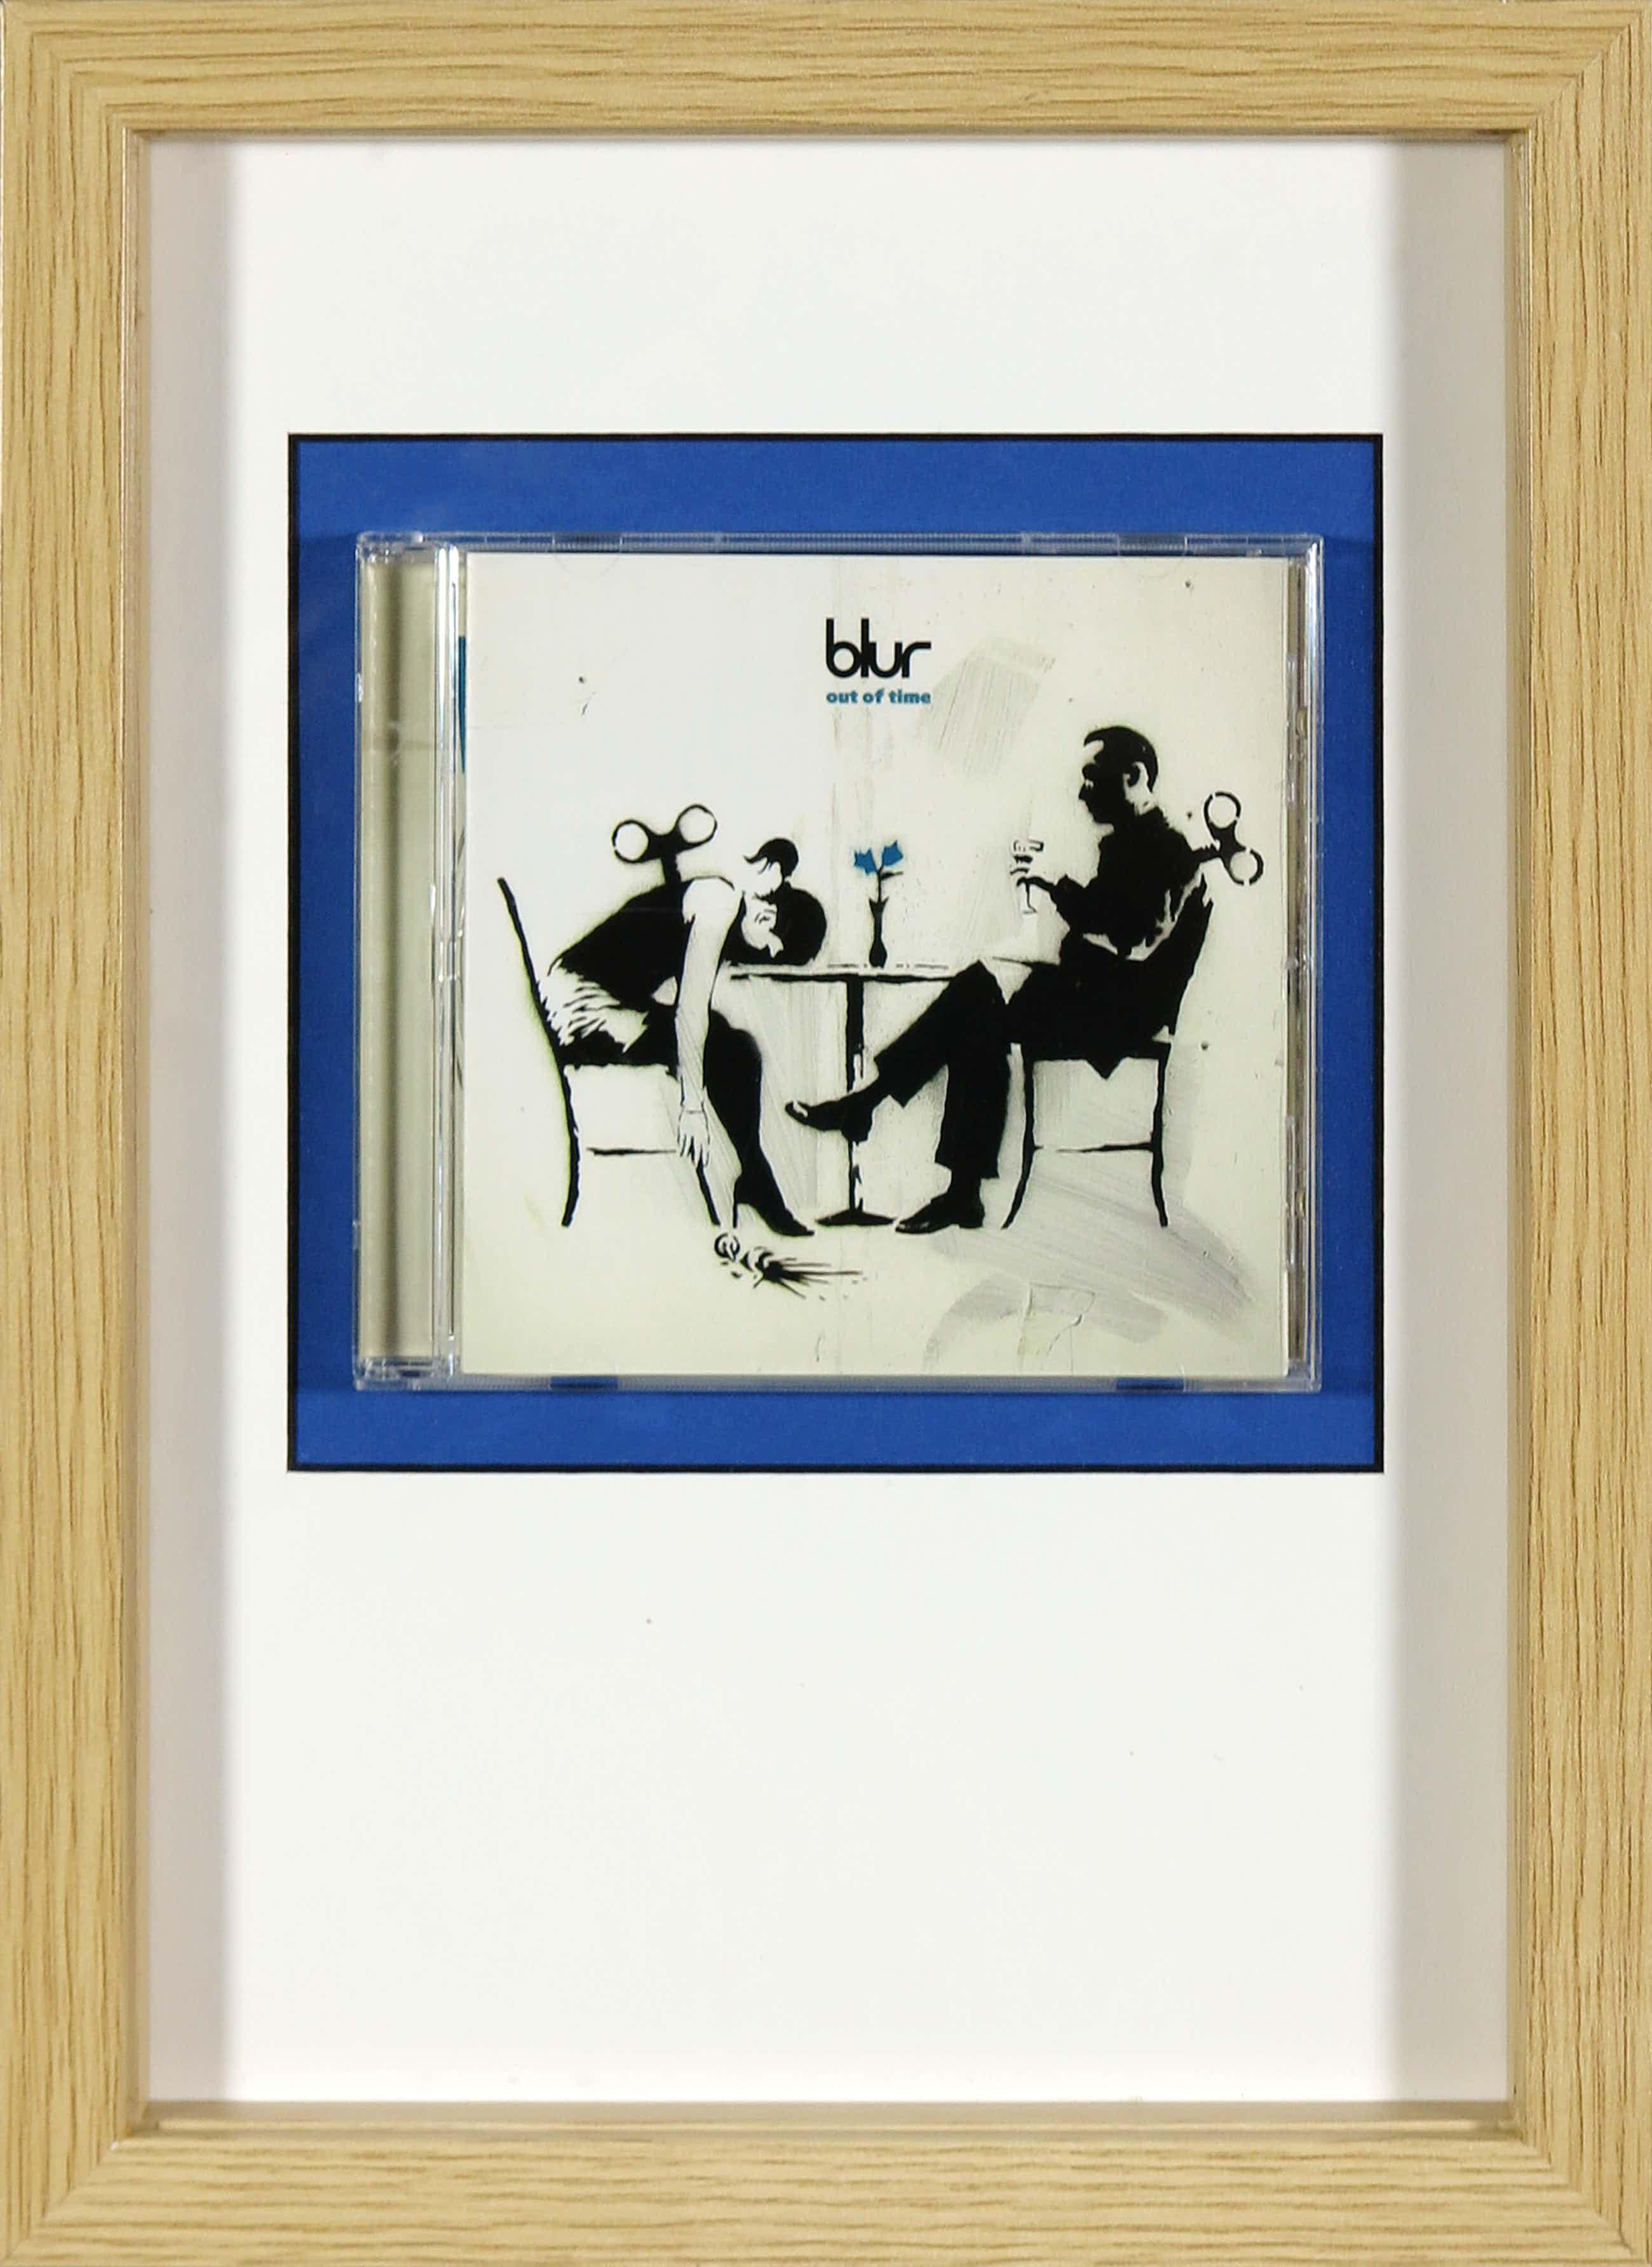 Banksy - Blur - Out of Time (CD) kopen? Bied vanaf 65!